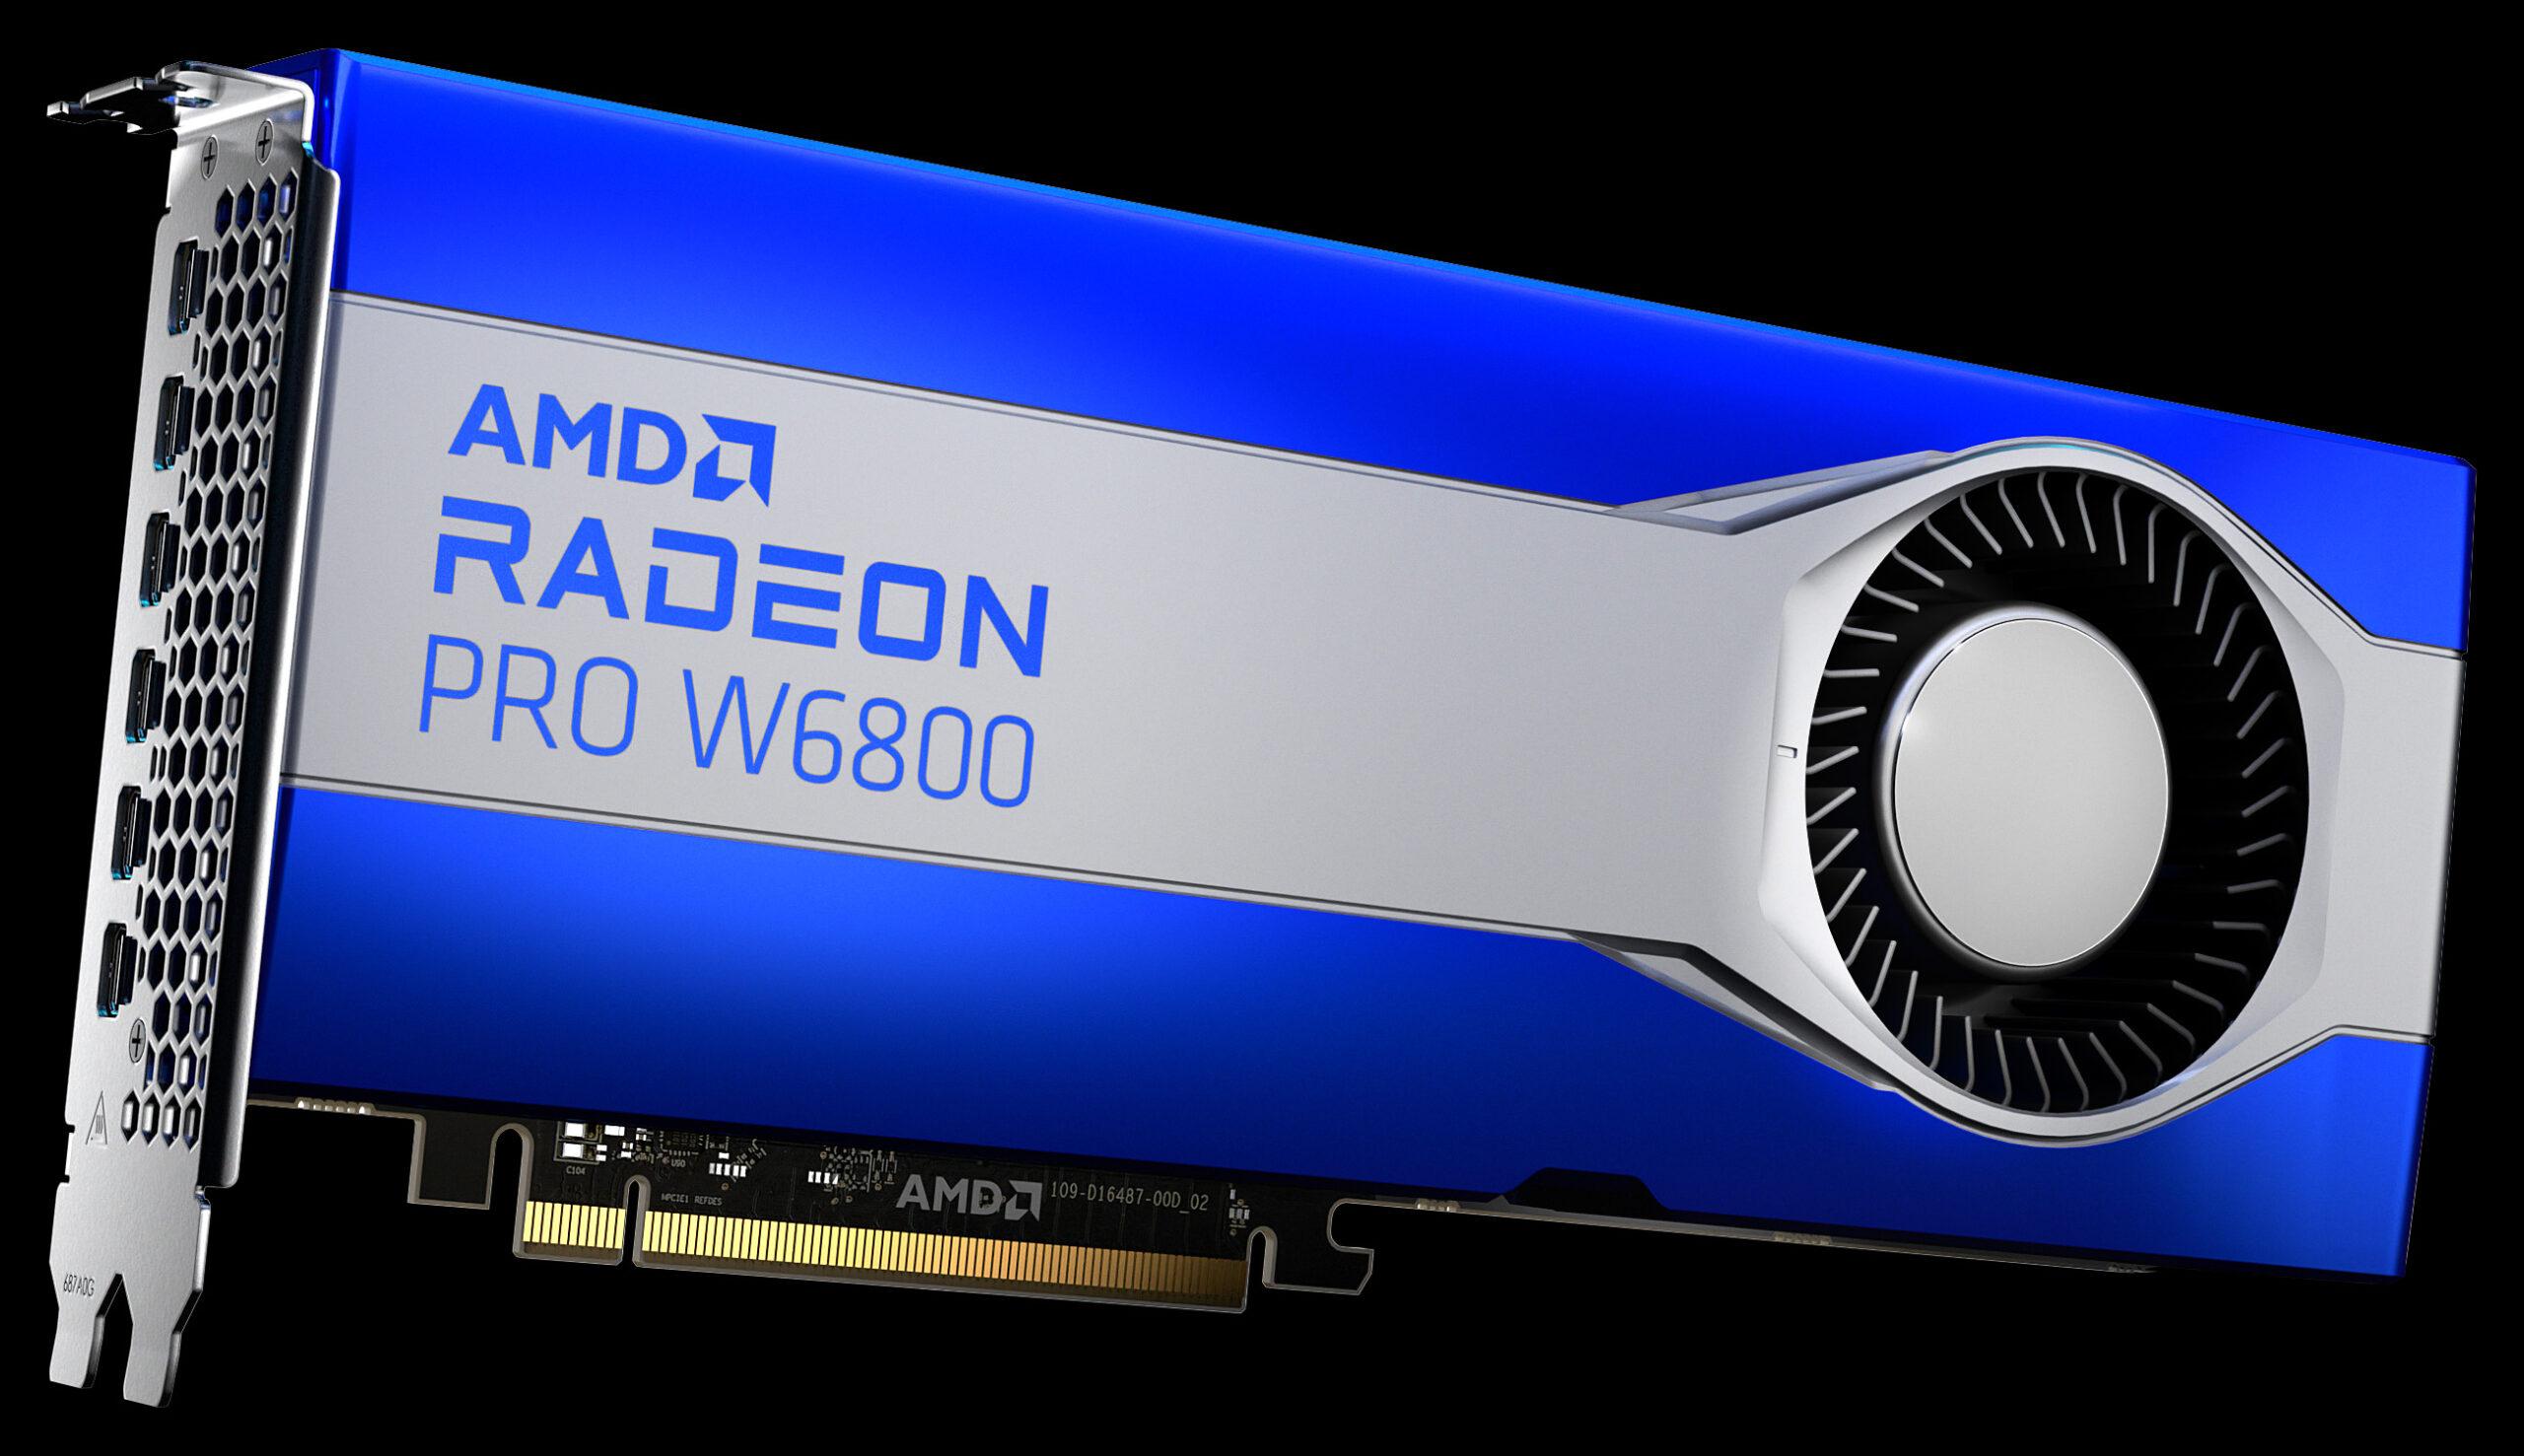 AMD Radeon Pro W6800 Workstation Graphics Card